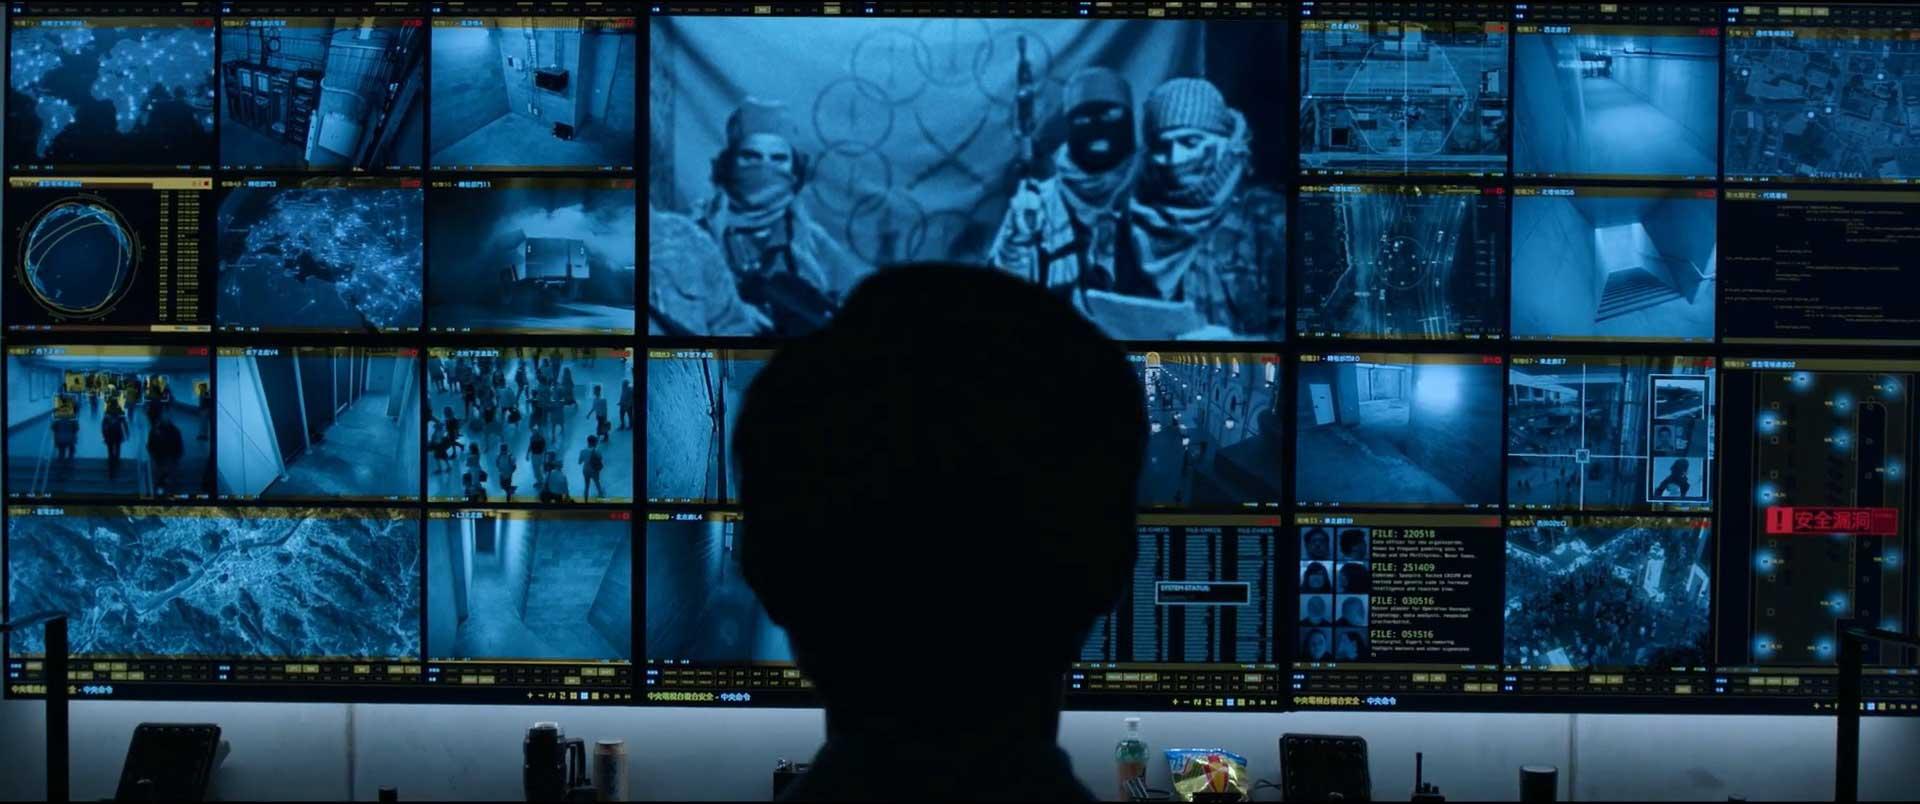 Shang-Chi Trailer 3 Iron Man Reference Ten Rings Easter Egg